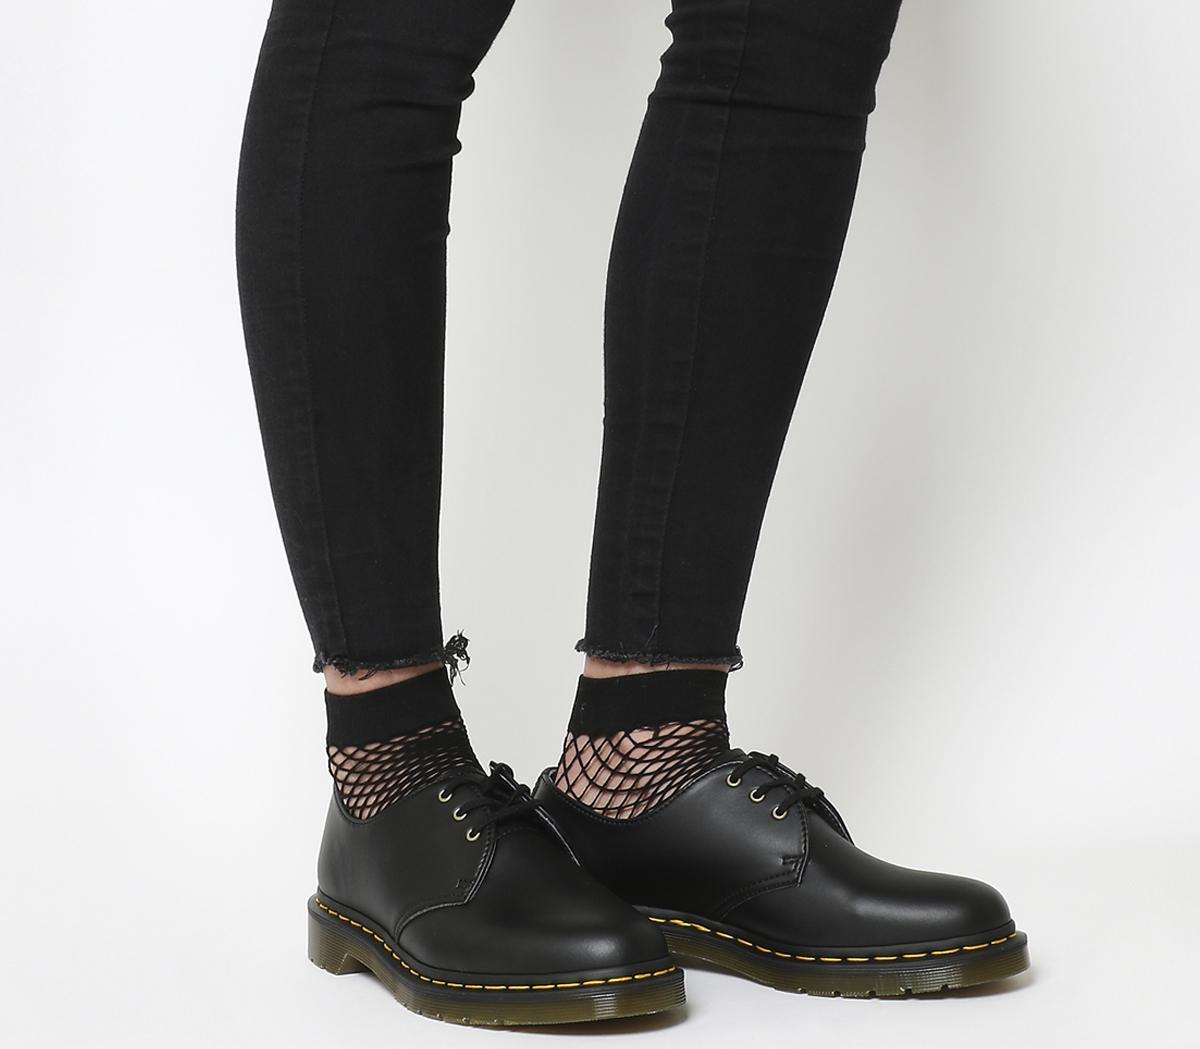 d14ad184f2 Dr. Martens Vegan 1461 3 Eye Shoes Black - Flats